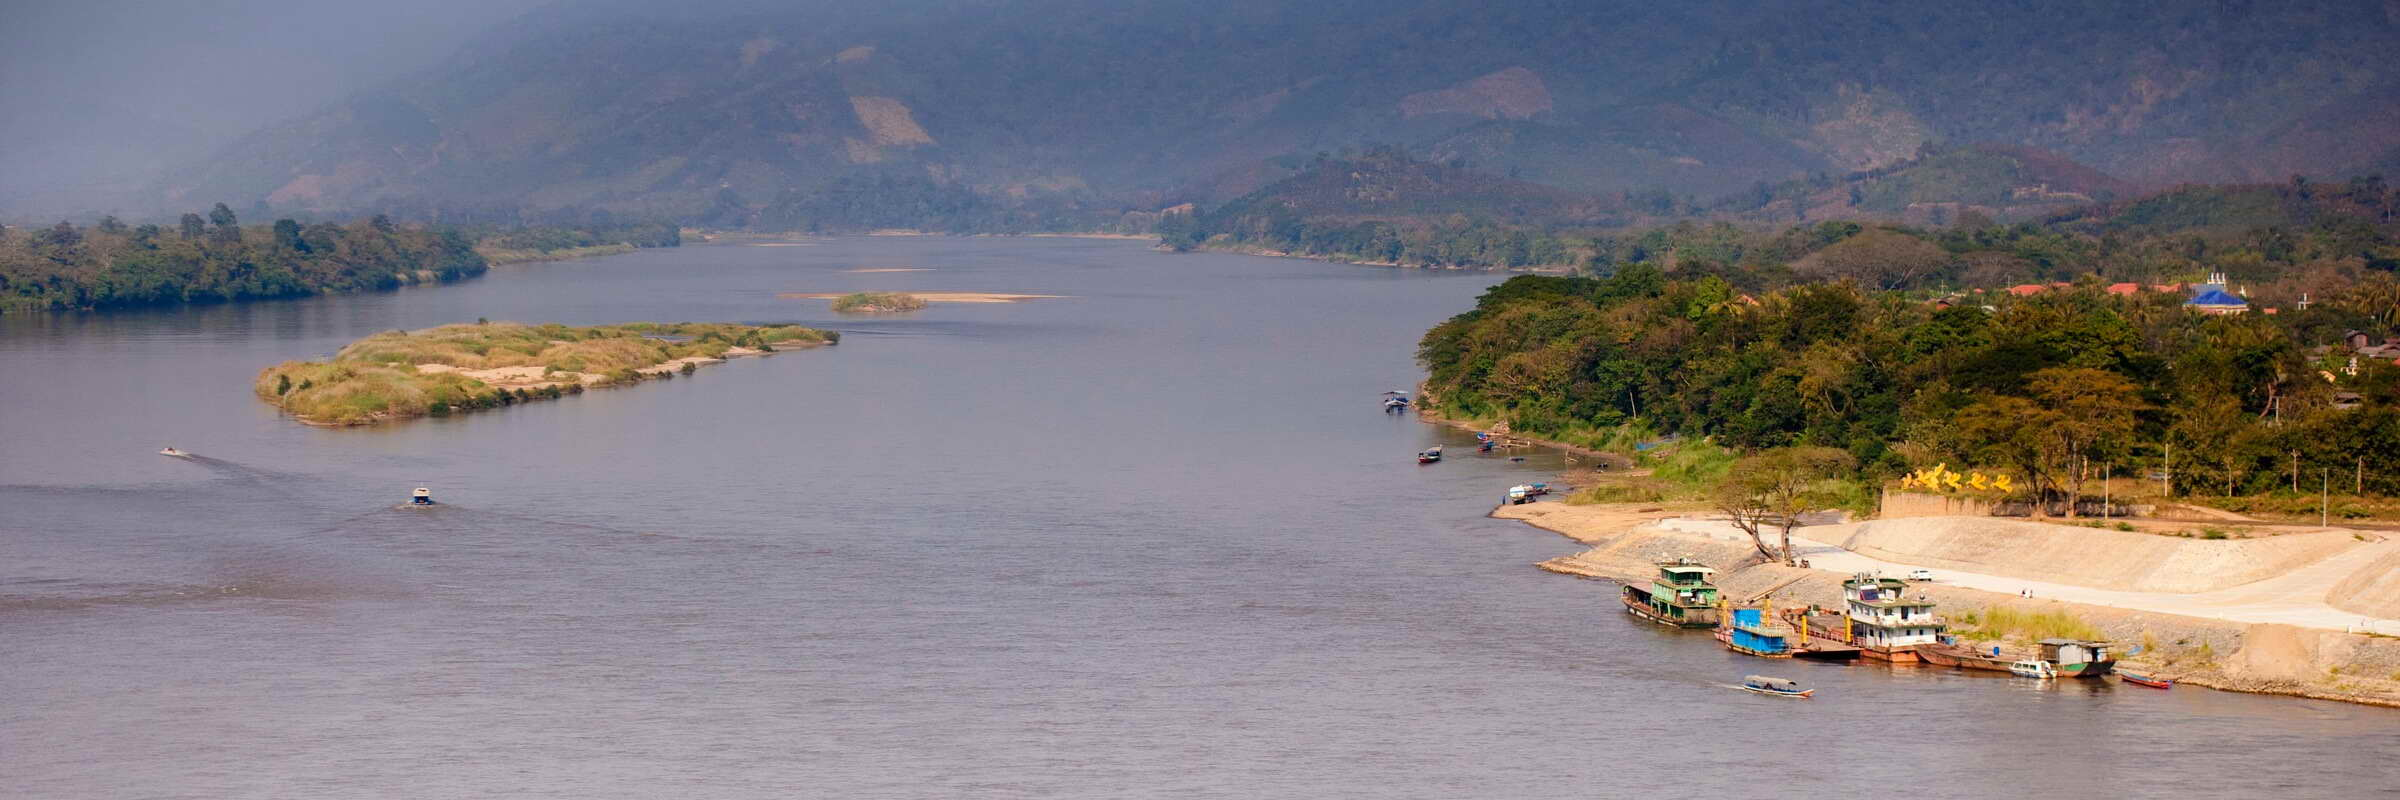 Das Goldene Dreieck ist geografisch gesehen der Ort, an dem der Fluss Ruak in den Mekong mündet.